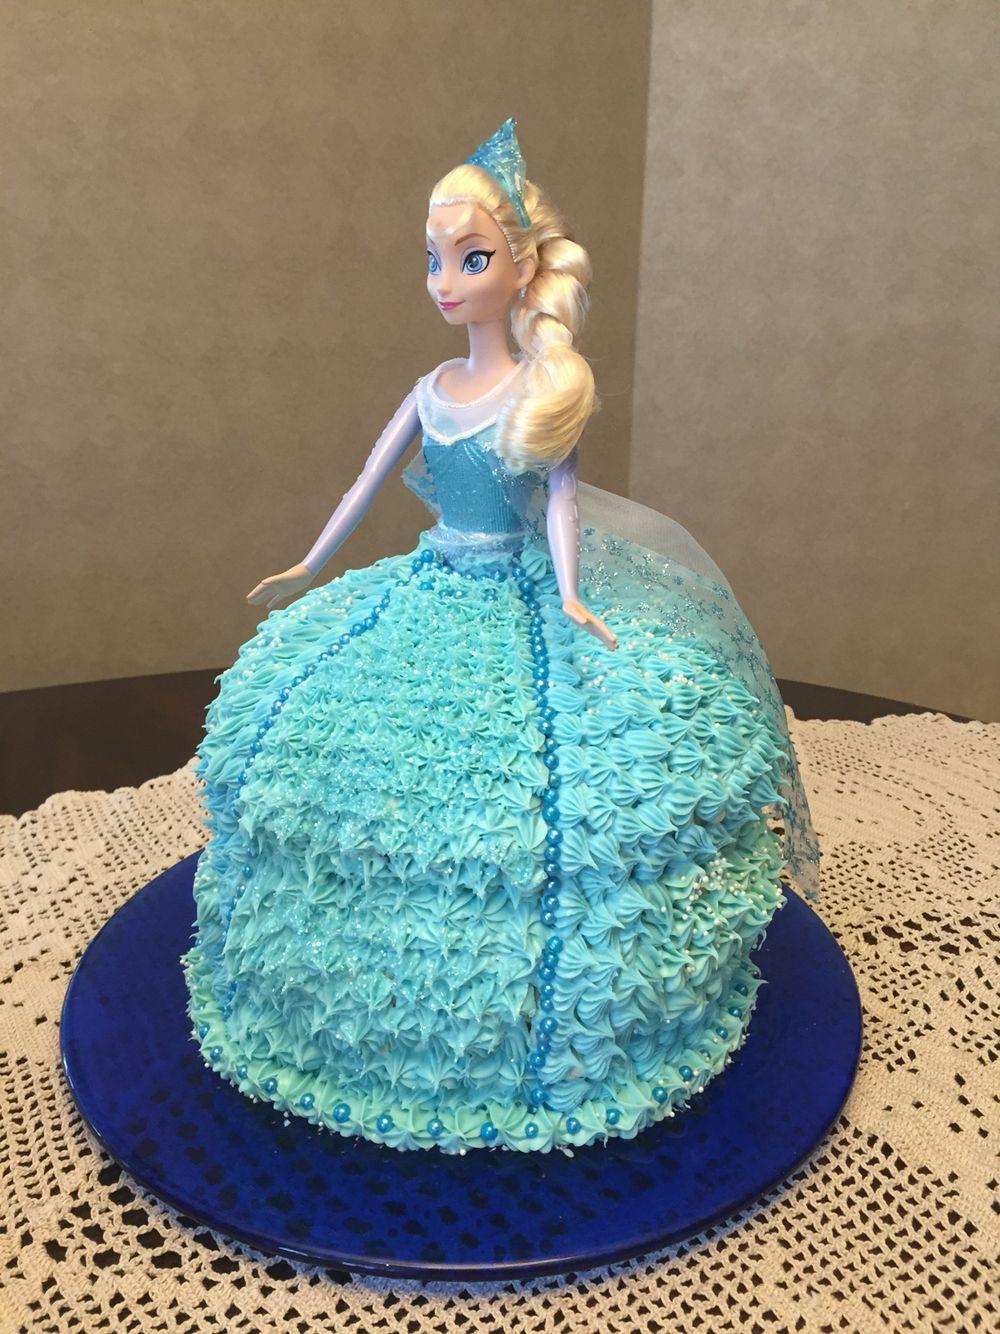 Elsa ( Disney's Frozen movie) Bday cake for 5 years old ...